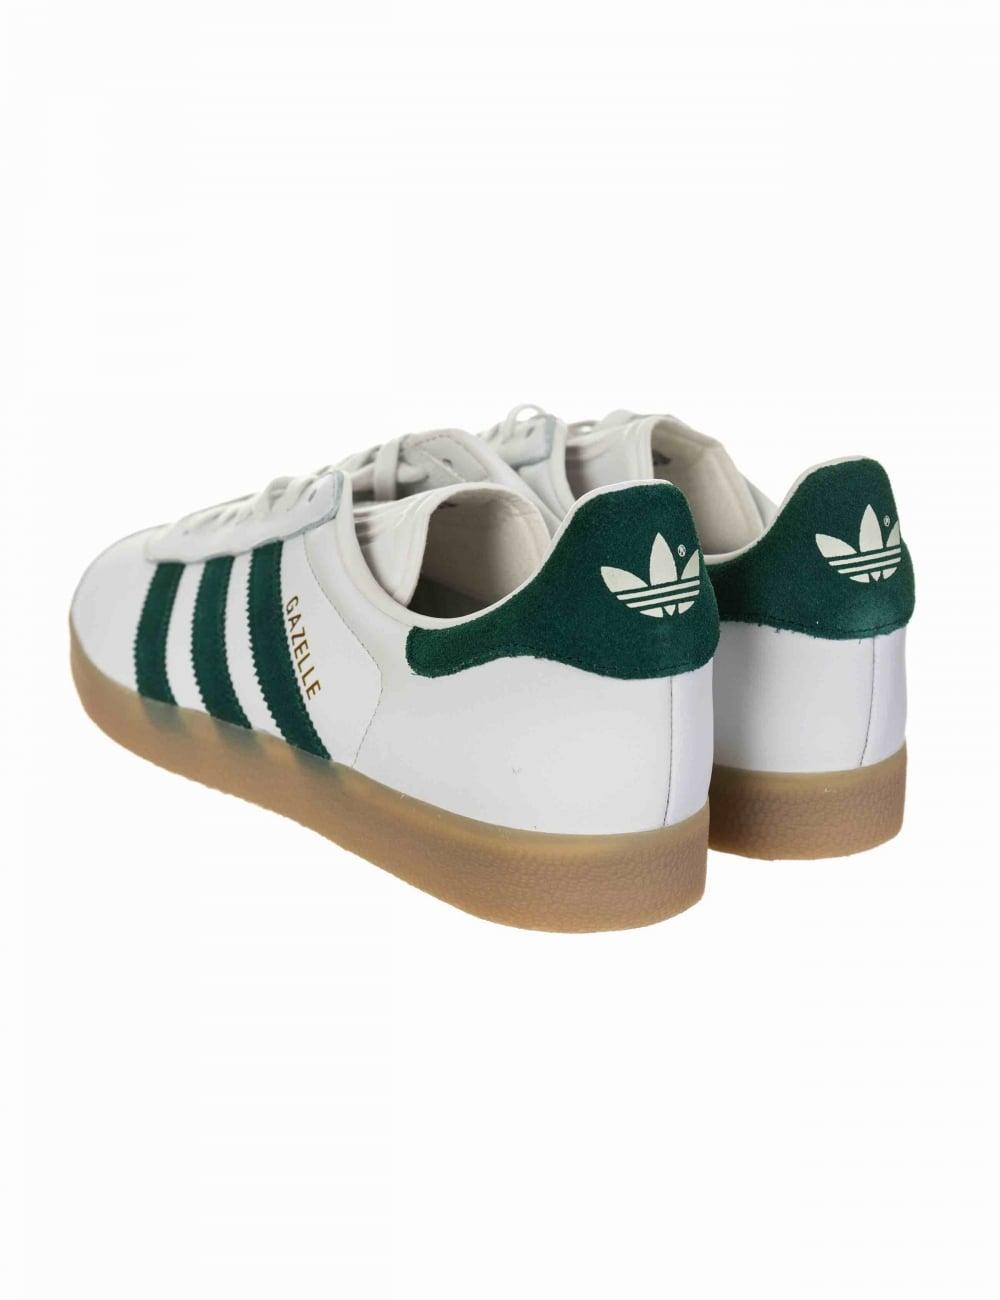 Gazelle OG Shoes - Vintage White/Collegiate Green